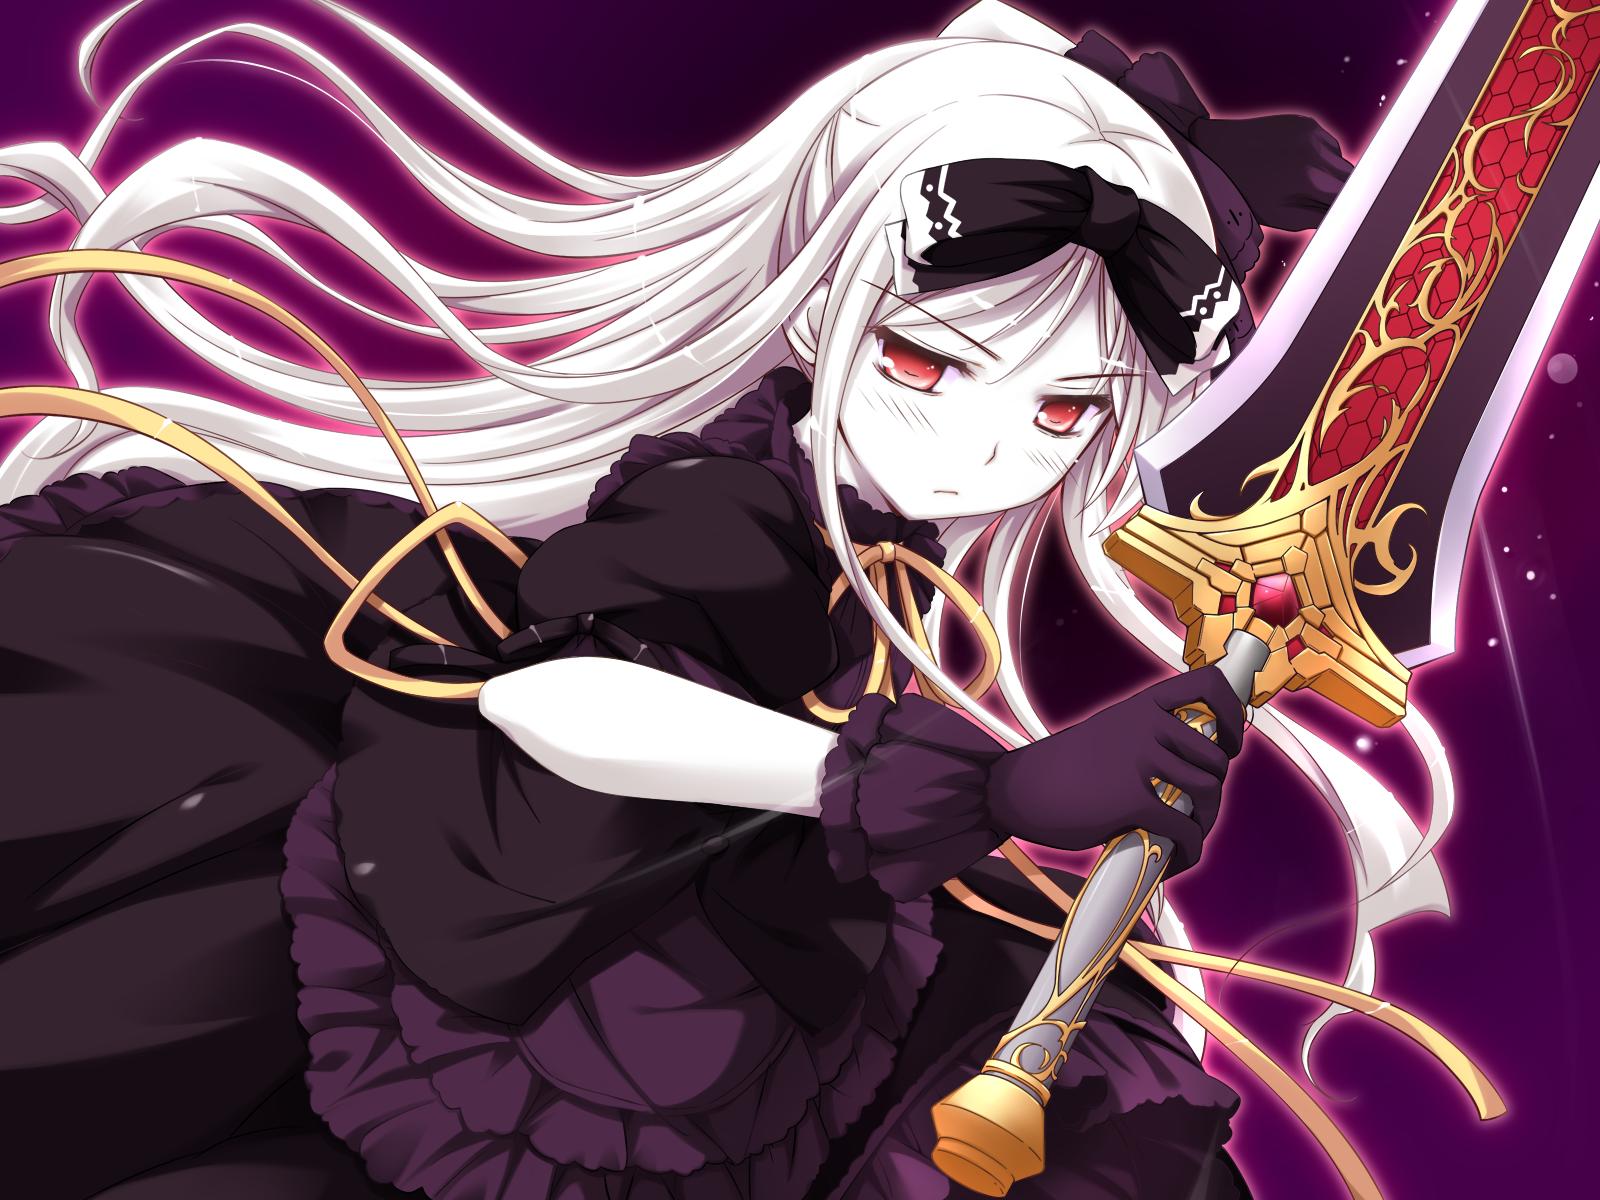 Princesses Konachan-com-73690-dress-game_cg-gloves-gothic-kocha-long_hair-red_eyes-ribbons-shukufuku_no_campanella-sword-weapon-white_hair